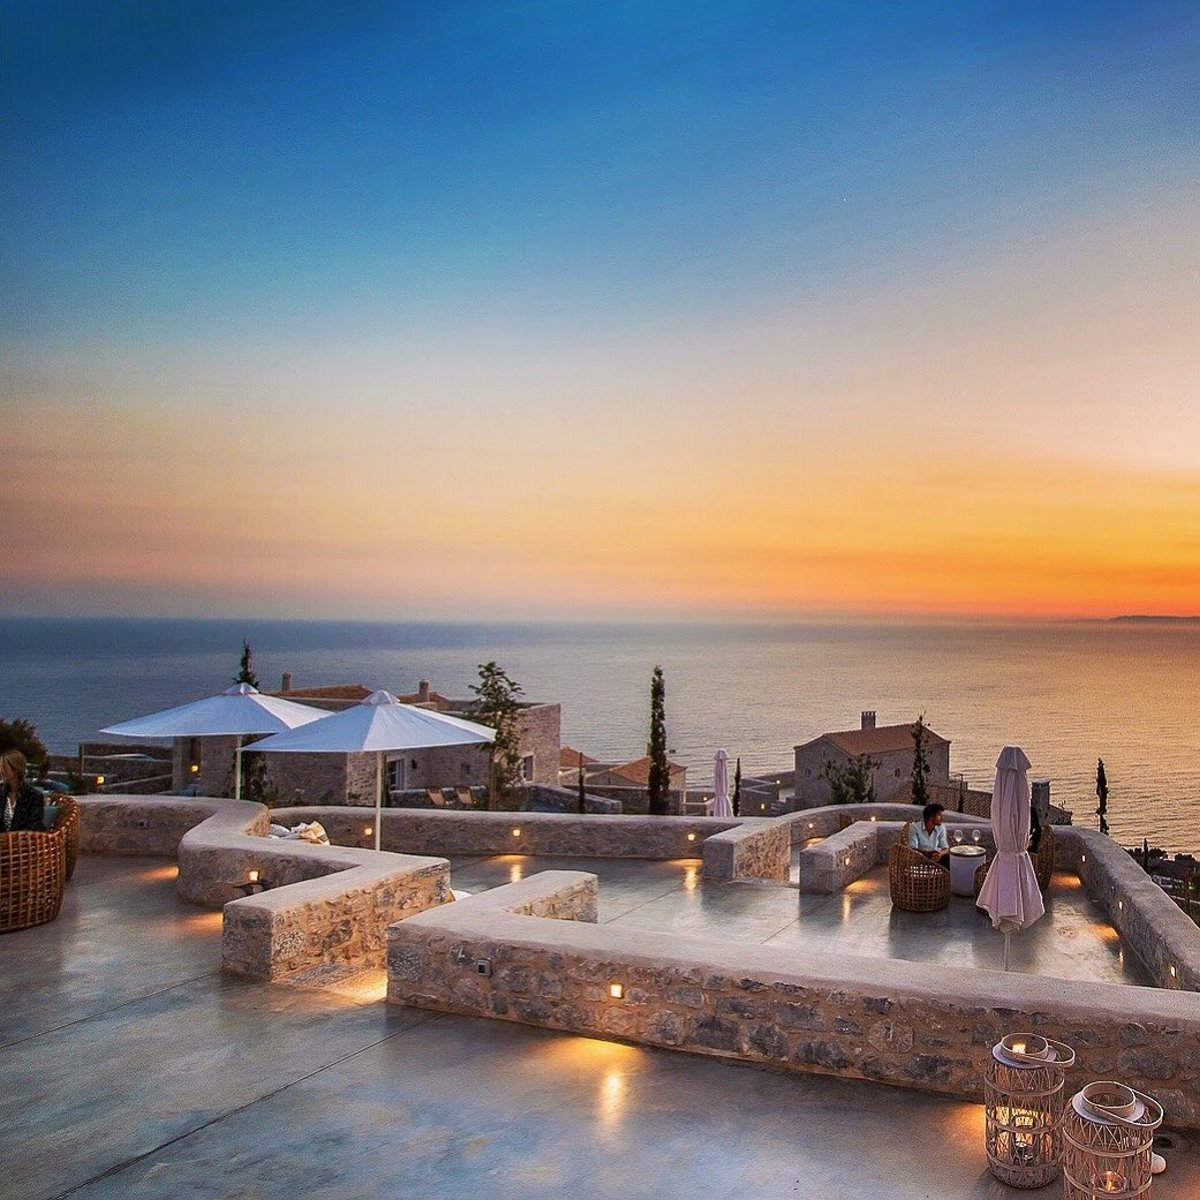 Bassa Maina ξενώνας Αρεόπολη ηλιοβασίλεμα με υπέροχη θέα